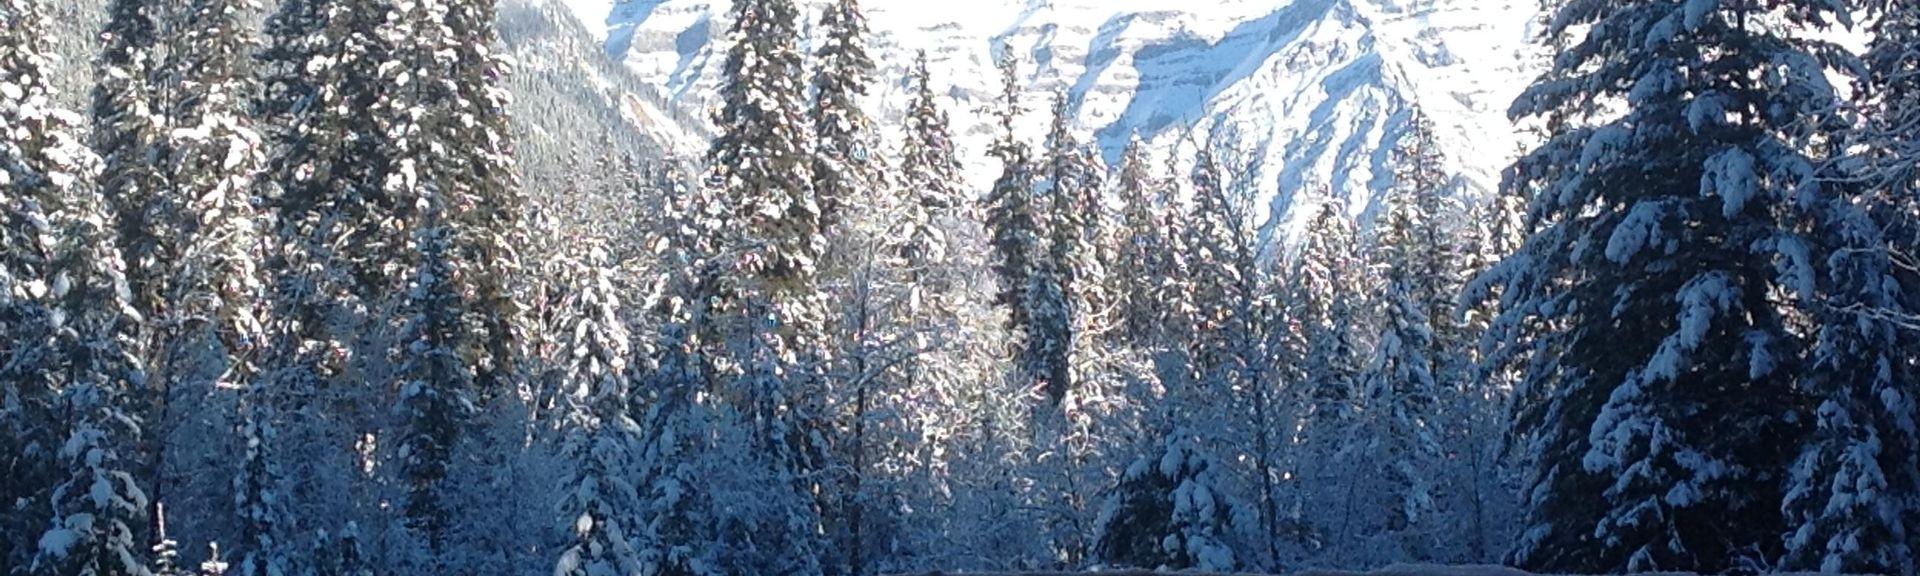 George Hicks Regional Park, Valemount, British Columbia, Canada